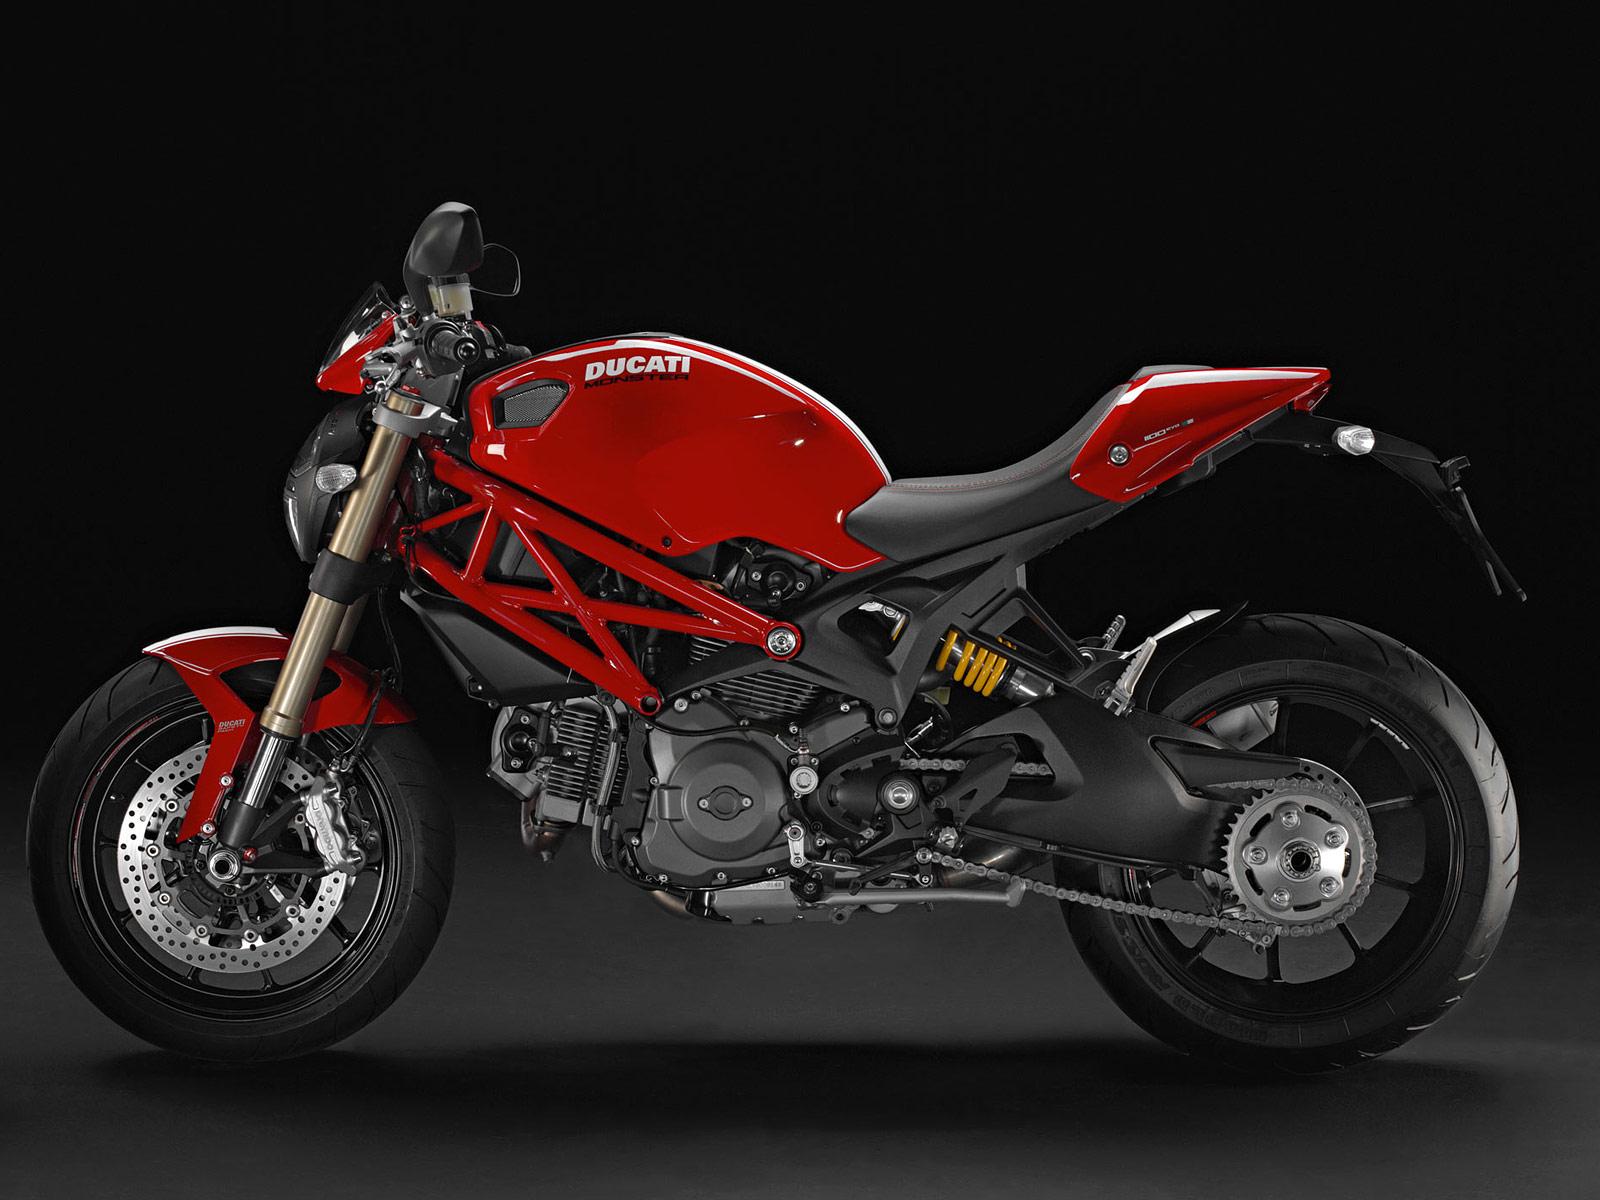 2013 ducati monster 1100 evo motorcycle insurance information. Black Bedroom Furniture Sets. Home Design Ideas